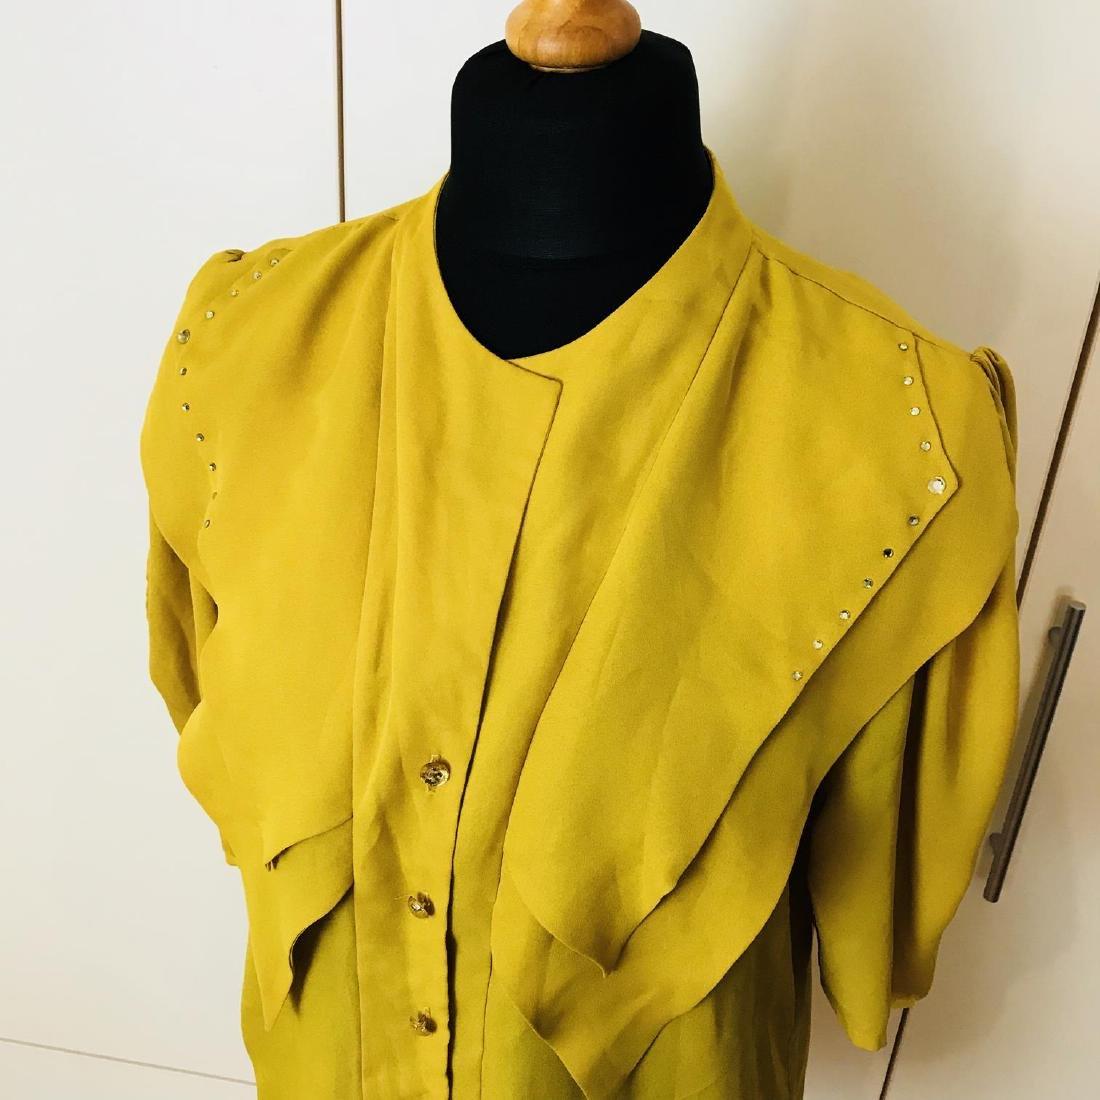 Vintage Women's Yellow Blouse Shirt Top Size EUR 40 US - 2